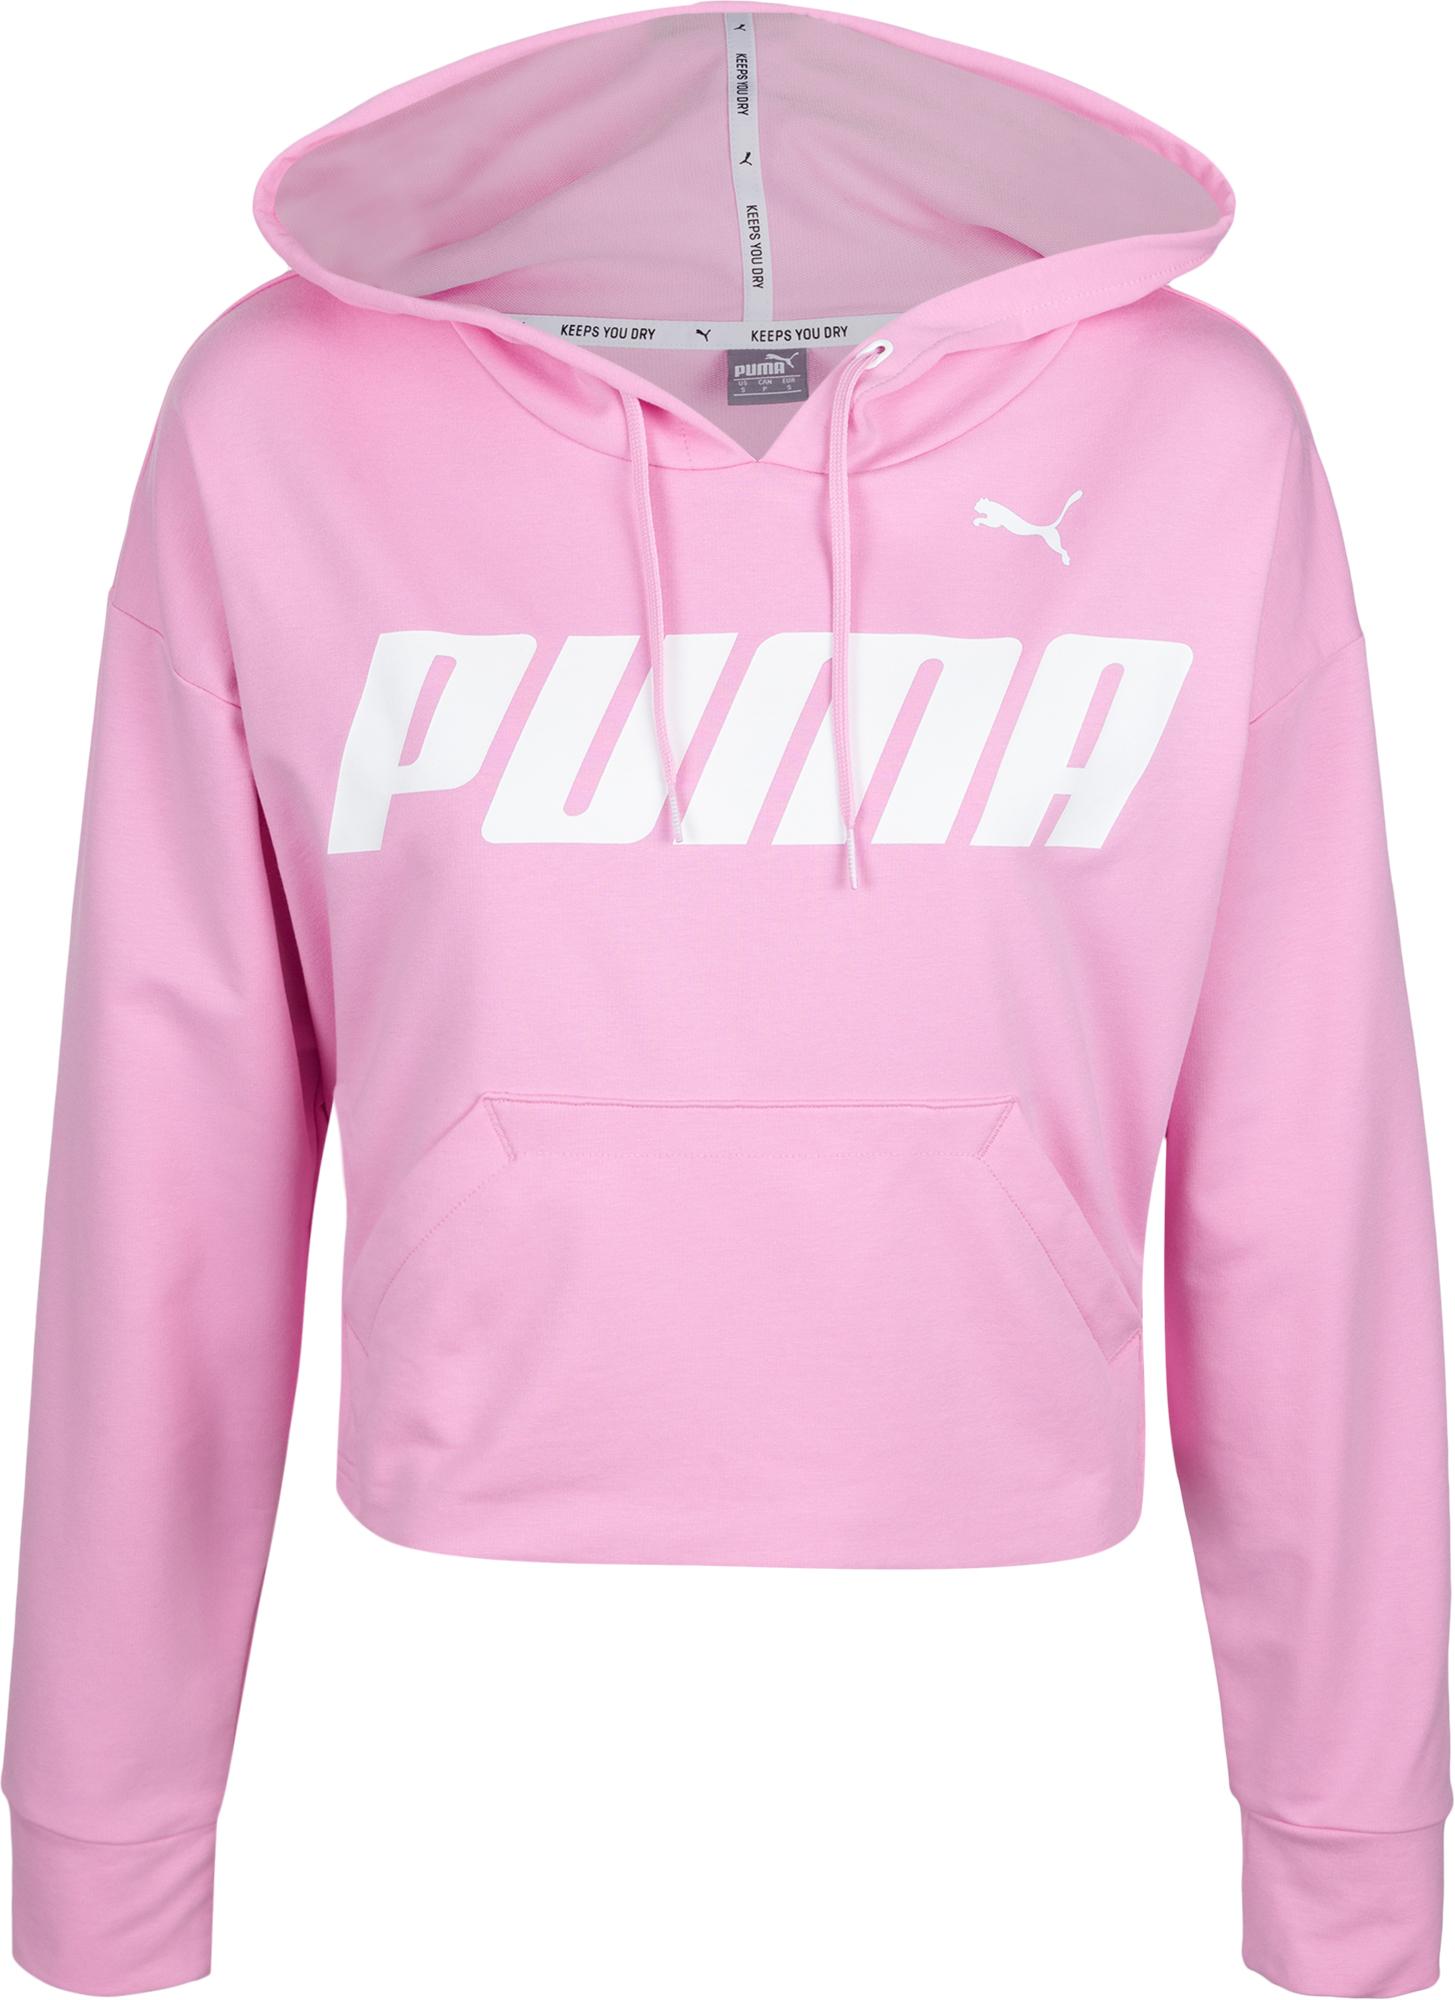 все цены на Puma Джемпер женский Puma Modern, размер 46-48 онлайн